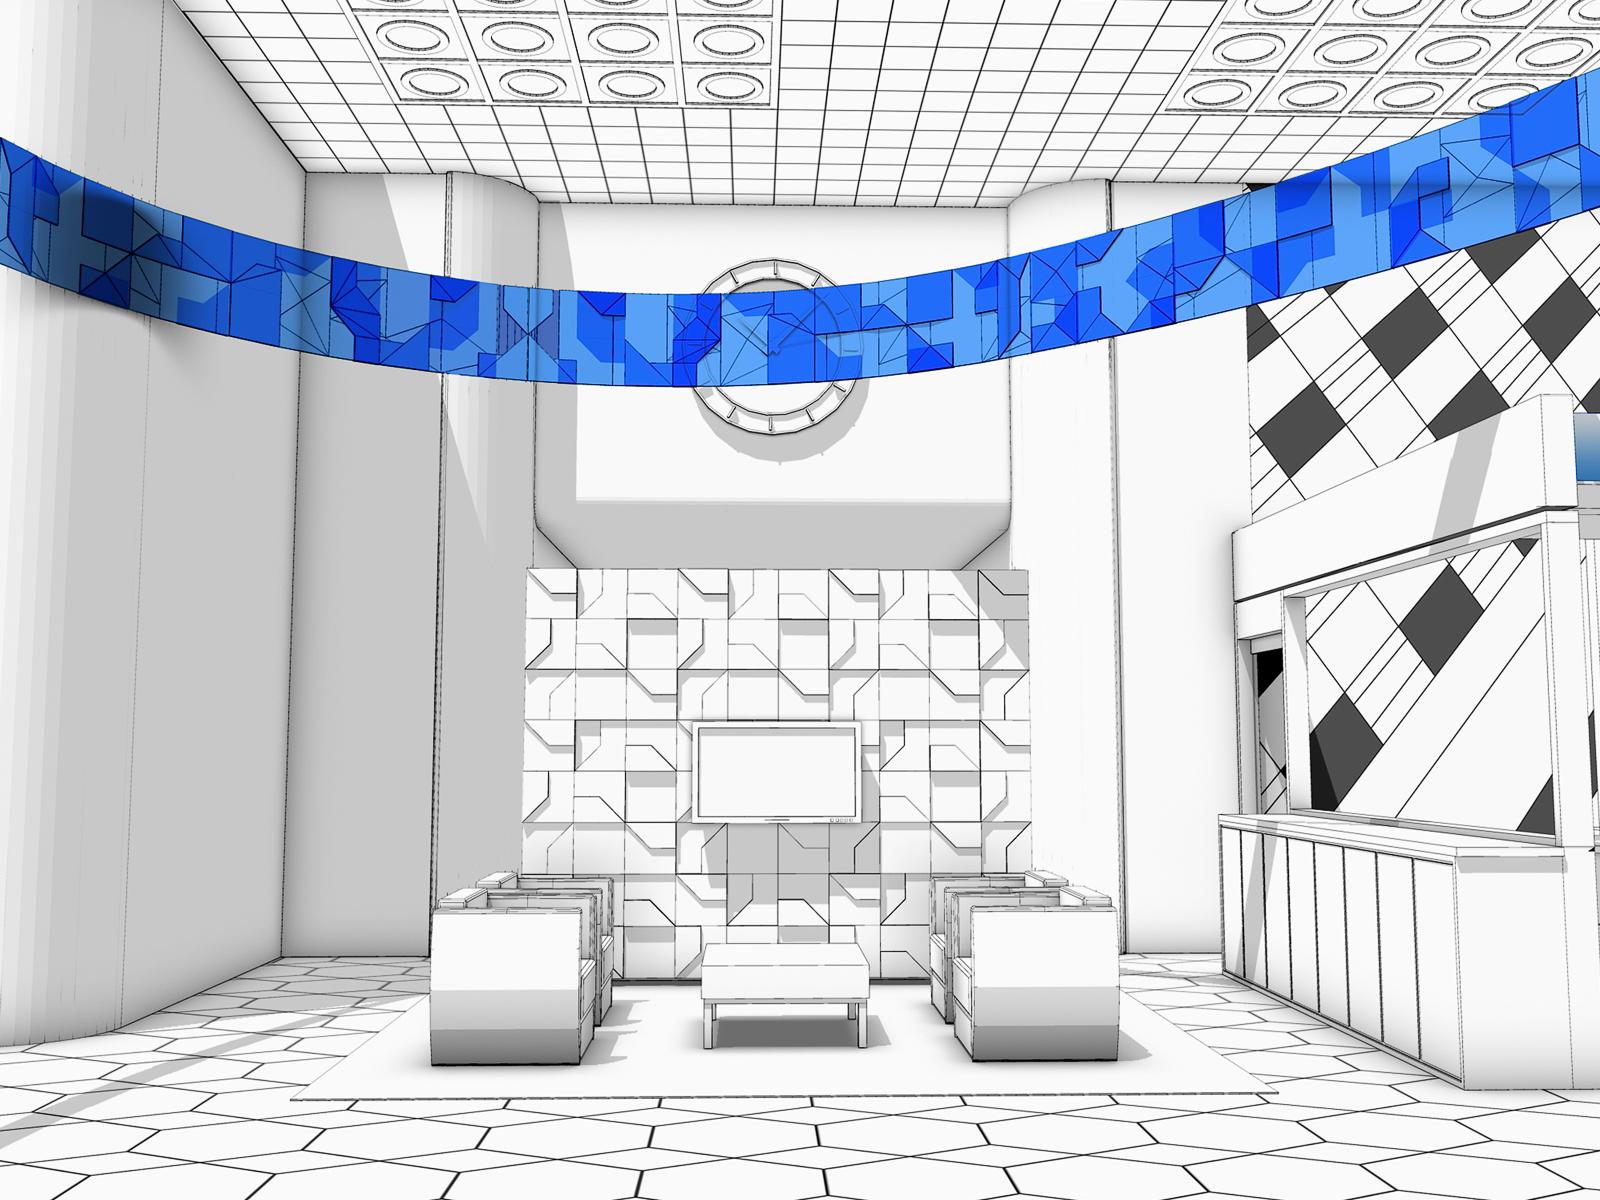 Chase - Rockefeller - cam3 Interior Perspective (18x24)